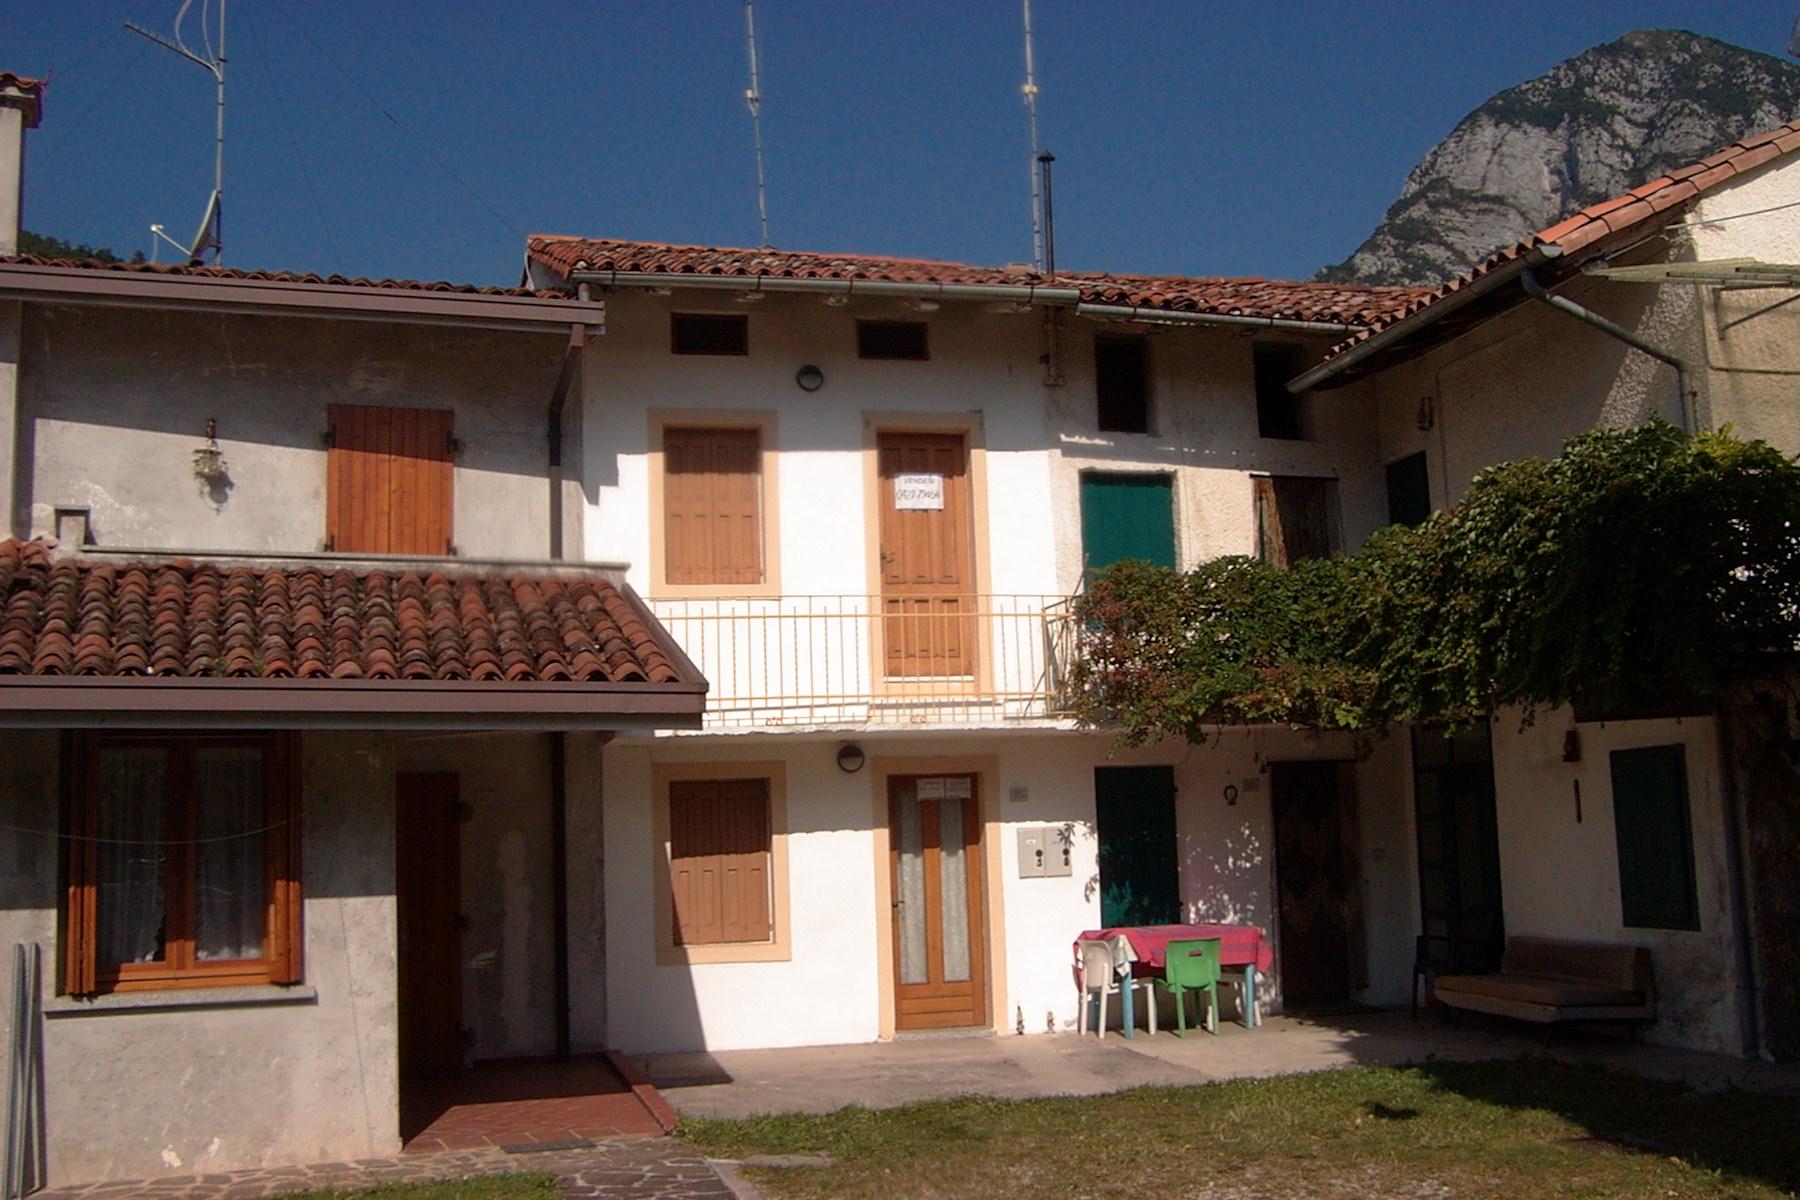 casa in linea  Montereale Valcellina  1048